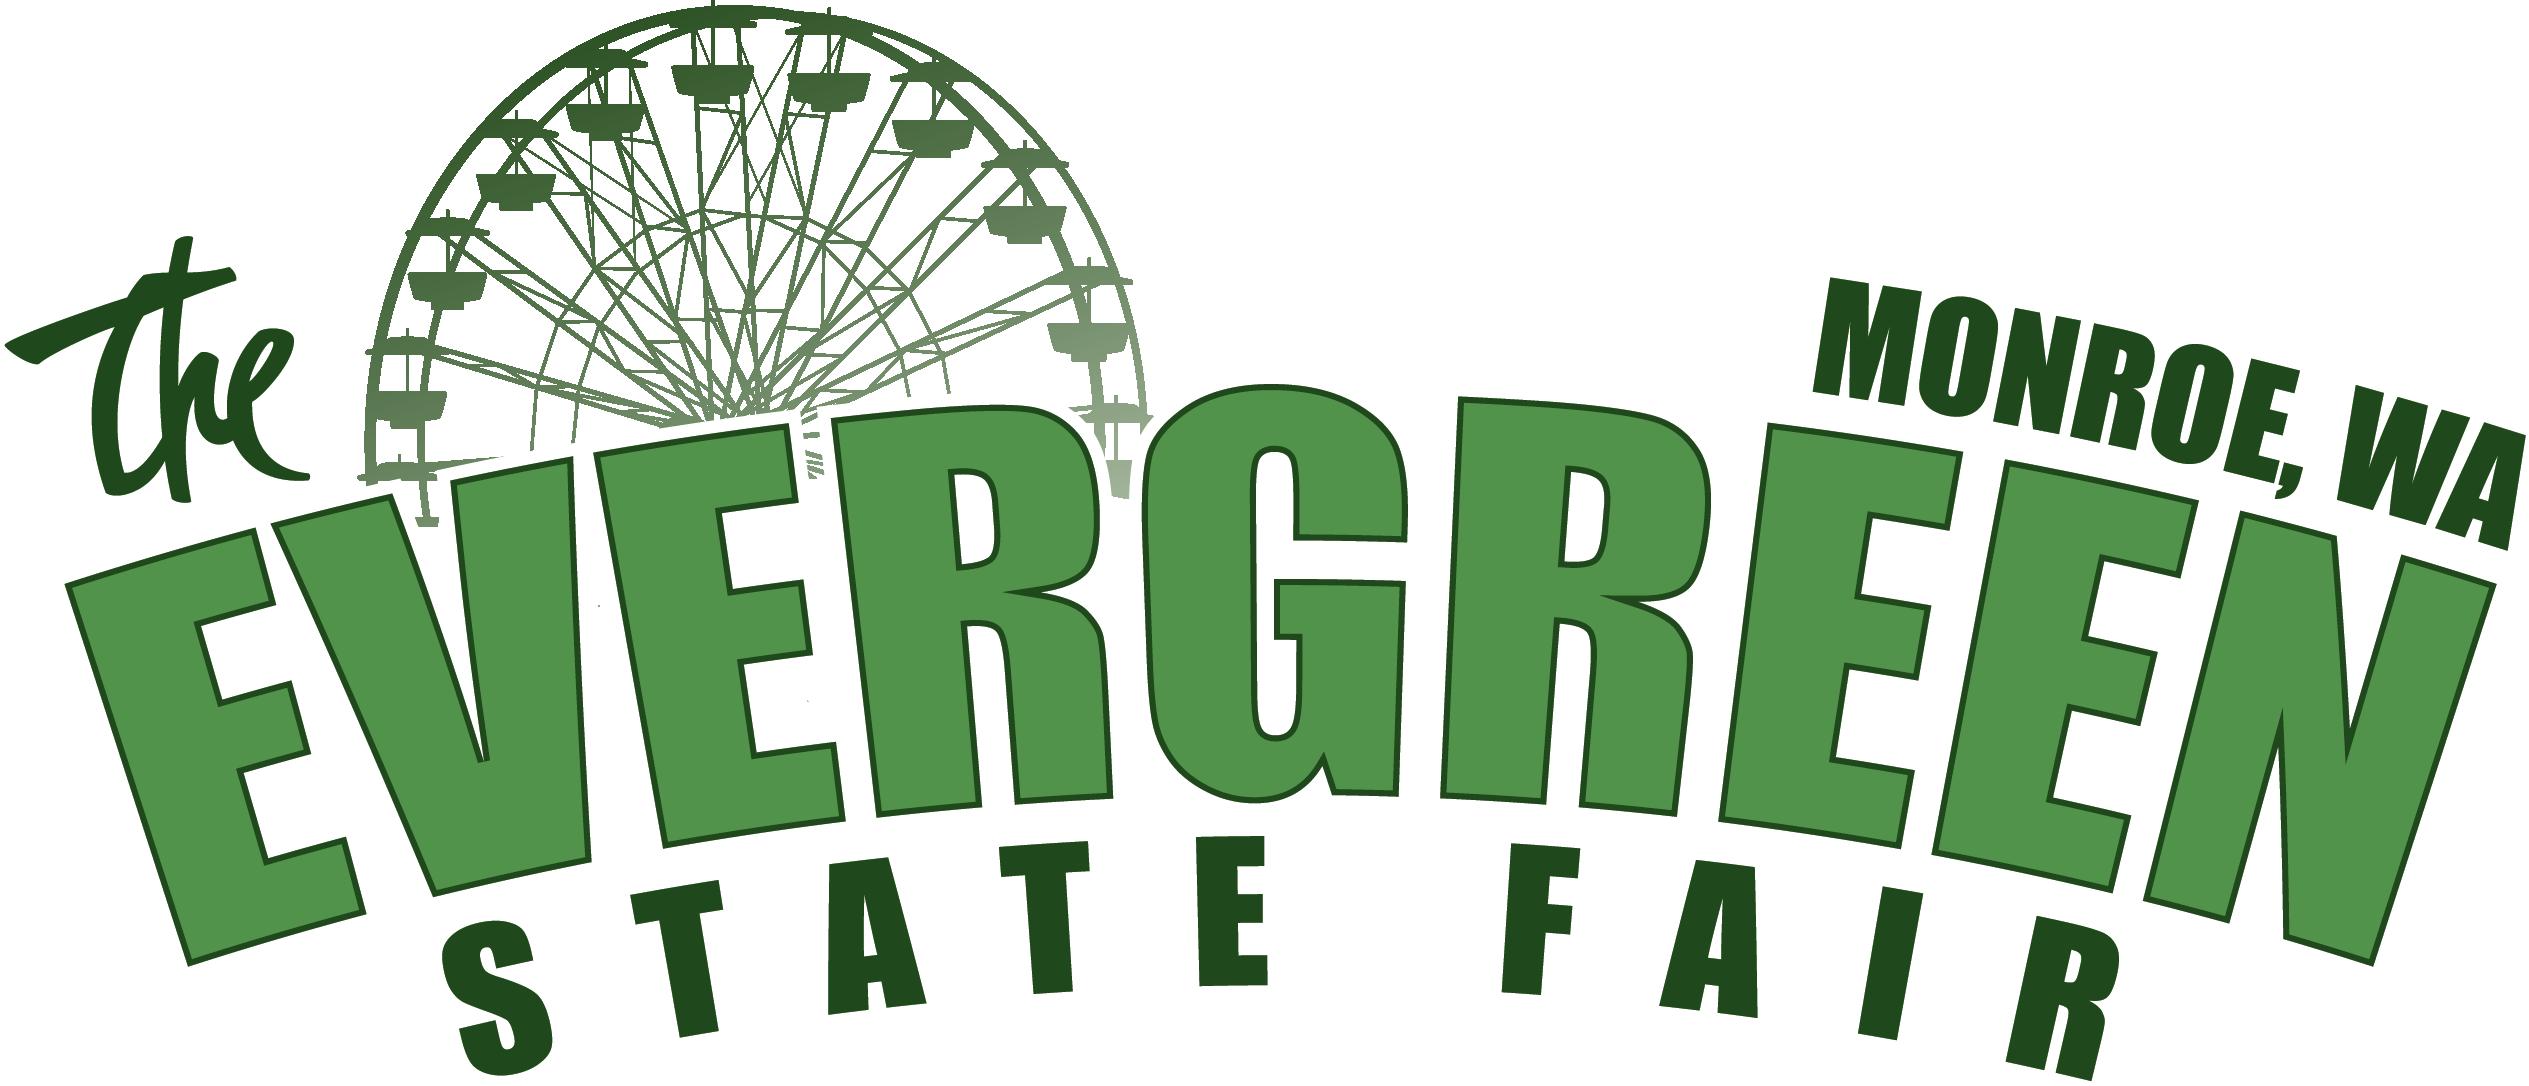 Evergreen State Fair 2020.Monroe Wa Jan 12 2020 Whr Motorsports